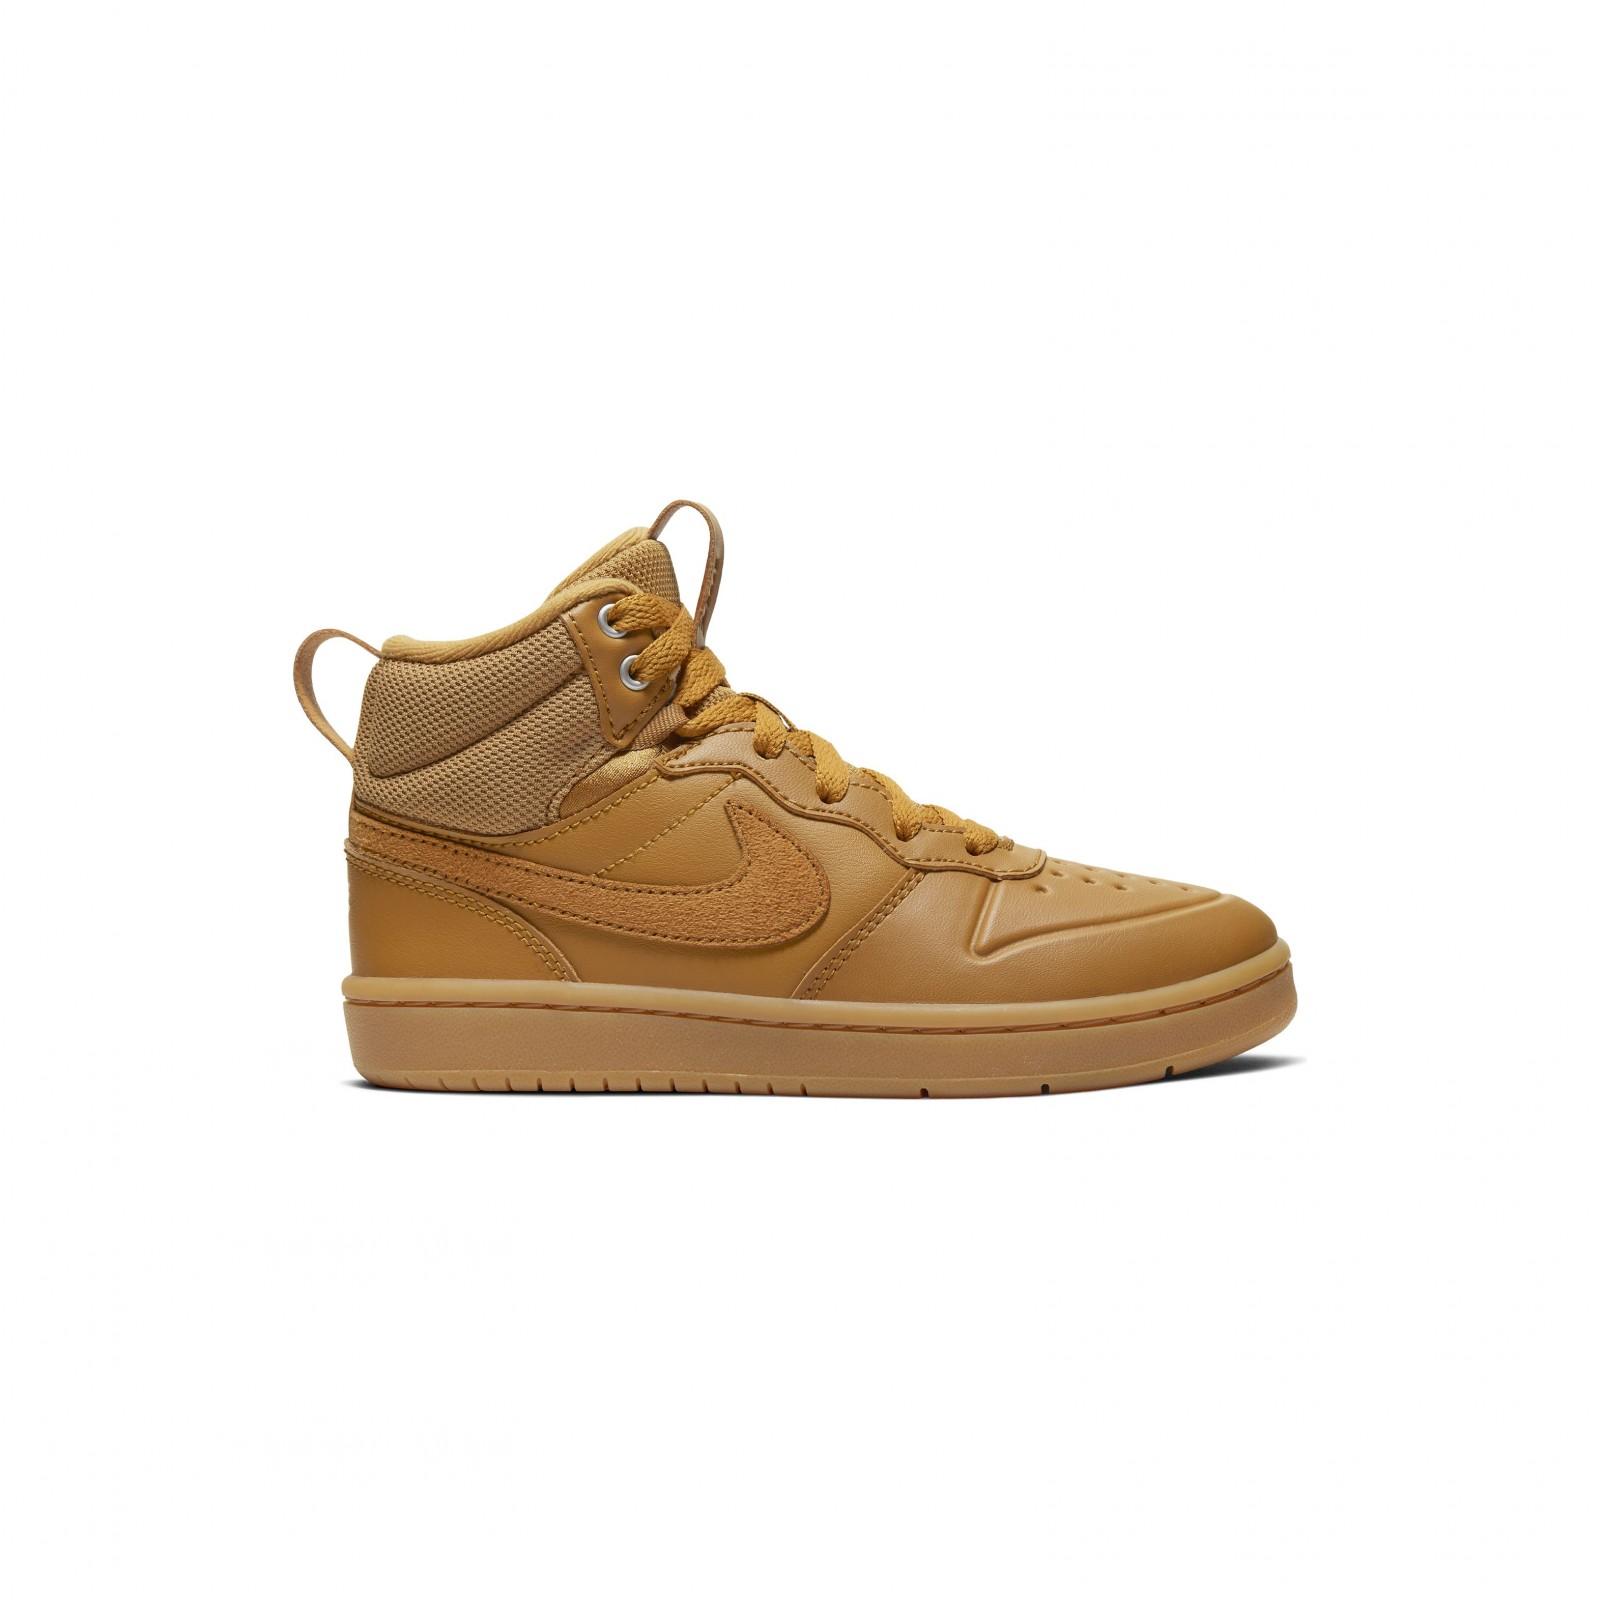 Nike Court Borough Mid 2 WHEAT/WHEAT-GUM MED BROWN